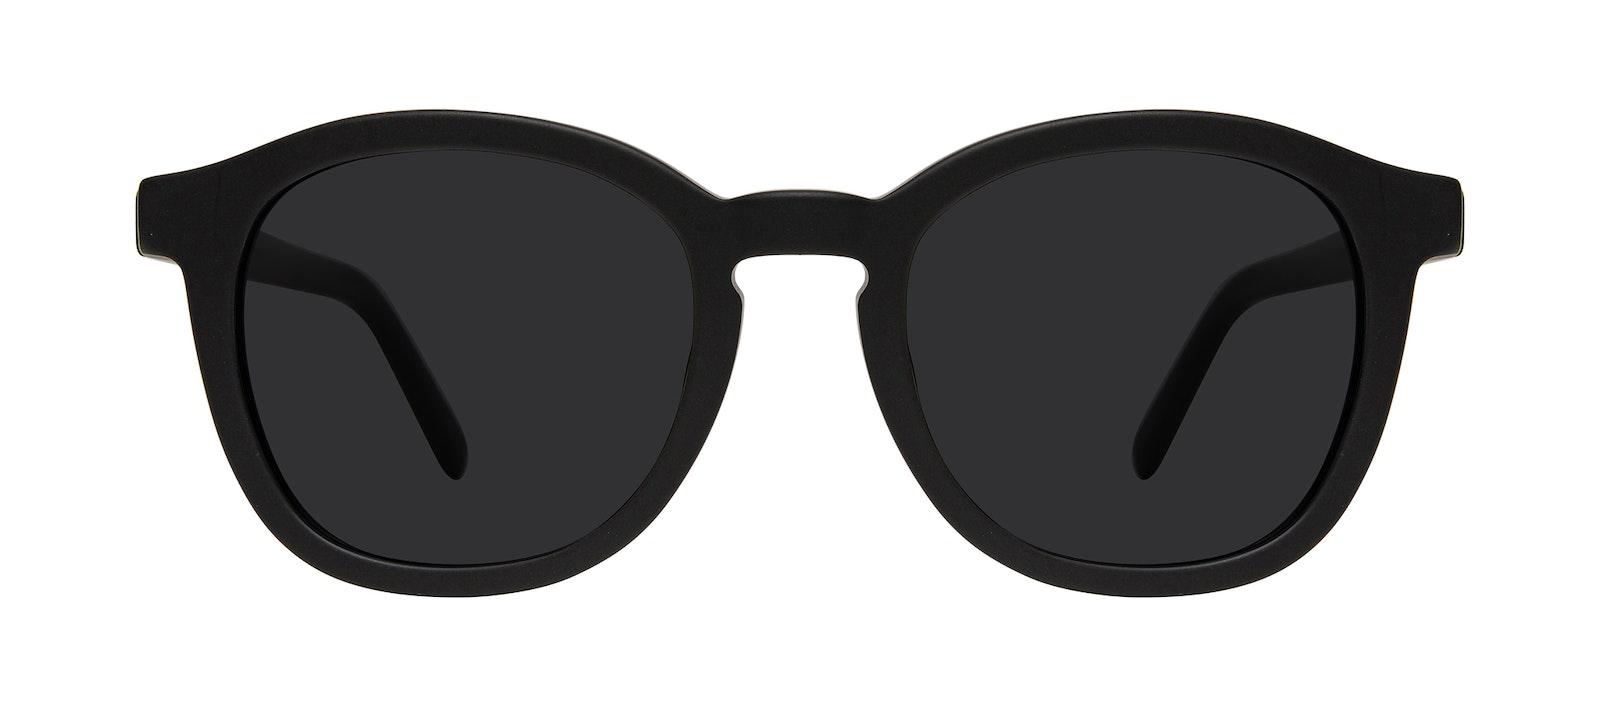 Affordable Fashion Glasses Round Sunglasses Men Script Matte Black Front